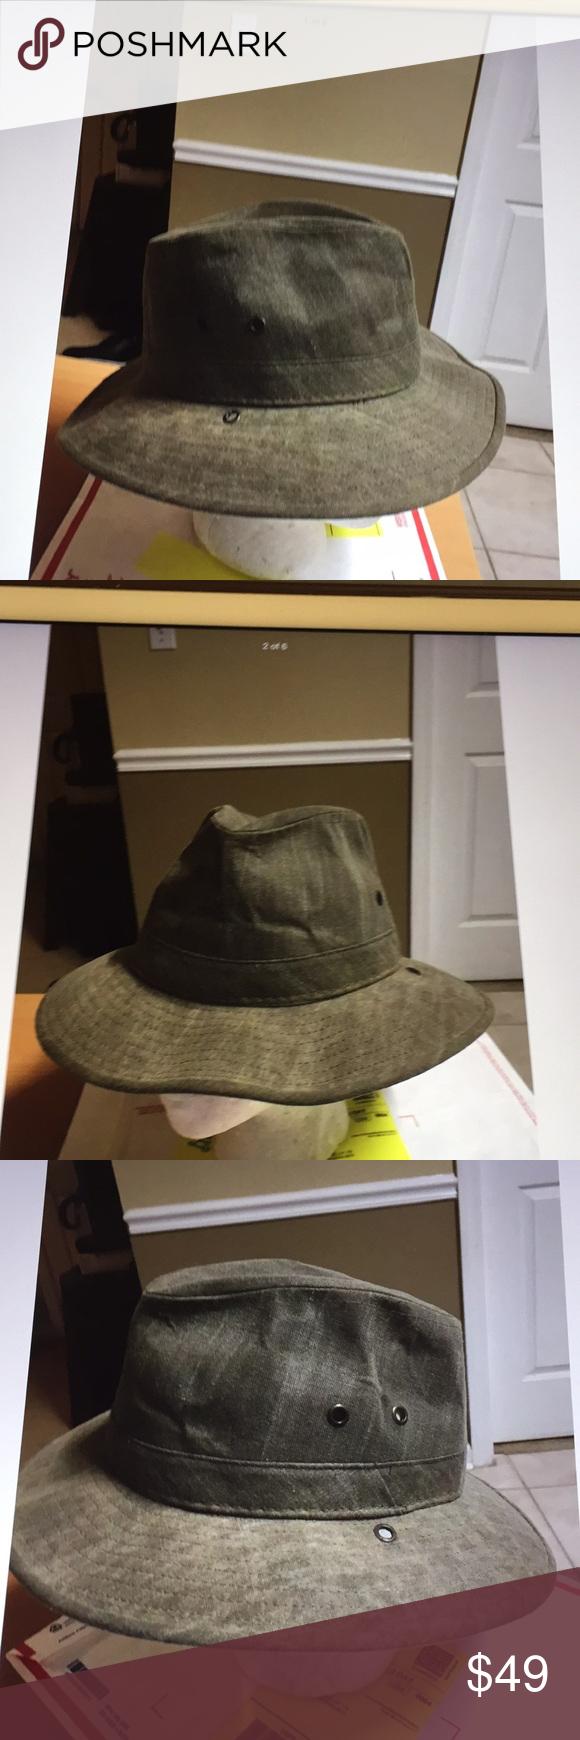 Orvis fedora hat png 580x1740 Orvis fedora hat dc24c45ee77c